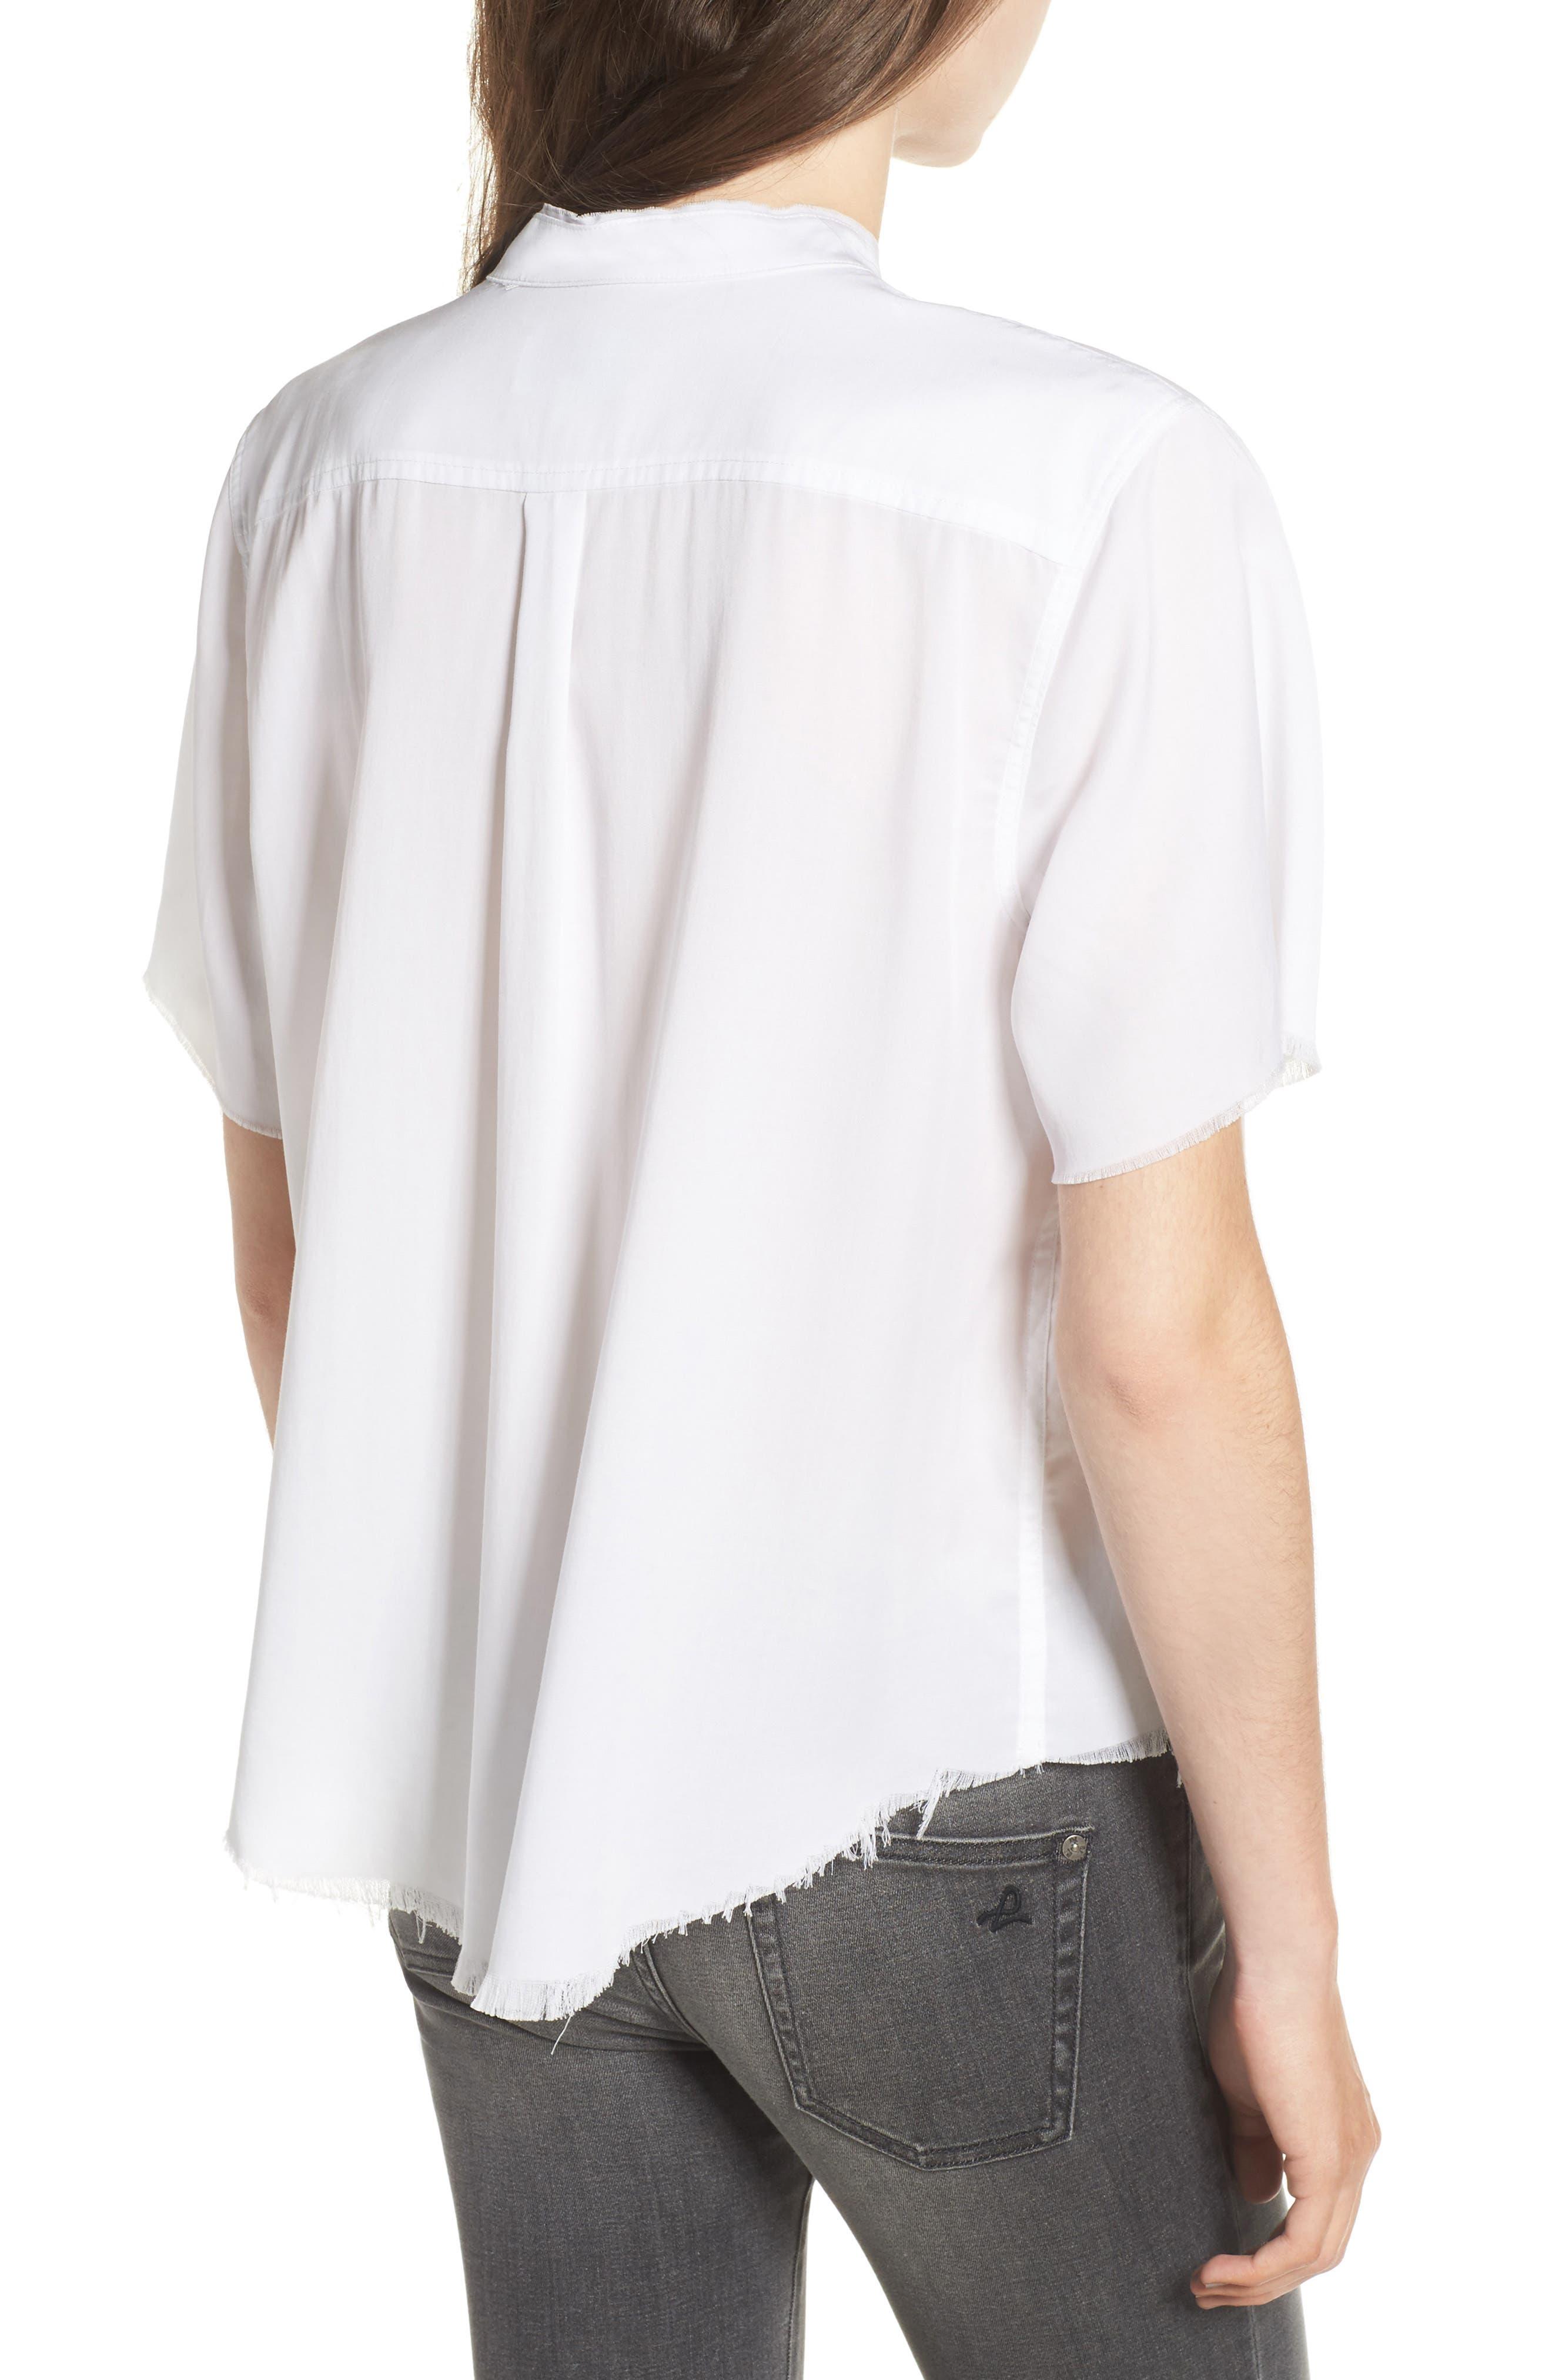 Montauk Shirt,                             Alternate thumbnail 3, color,